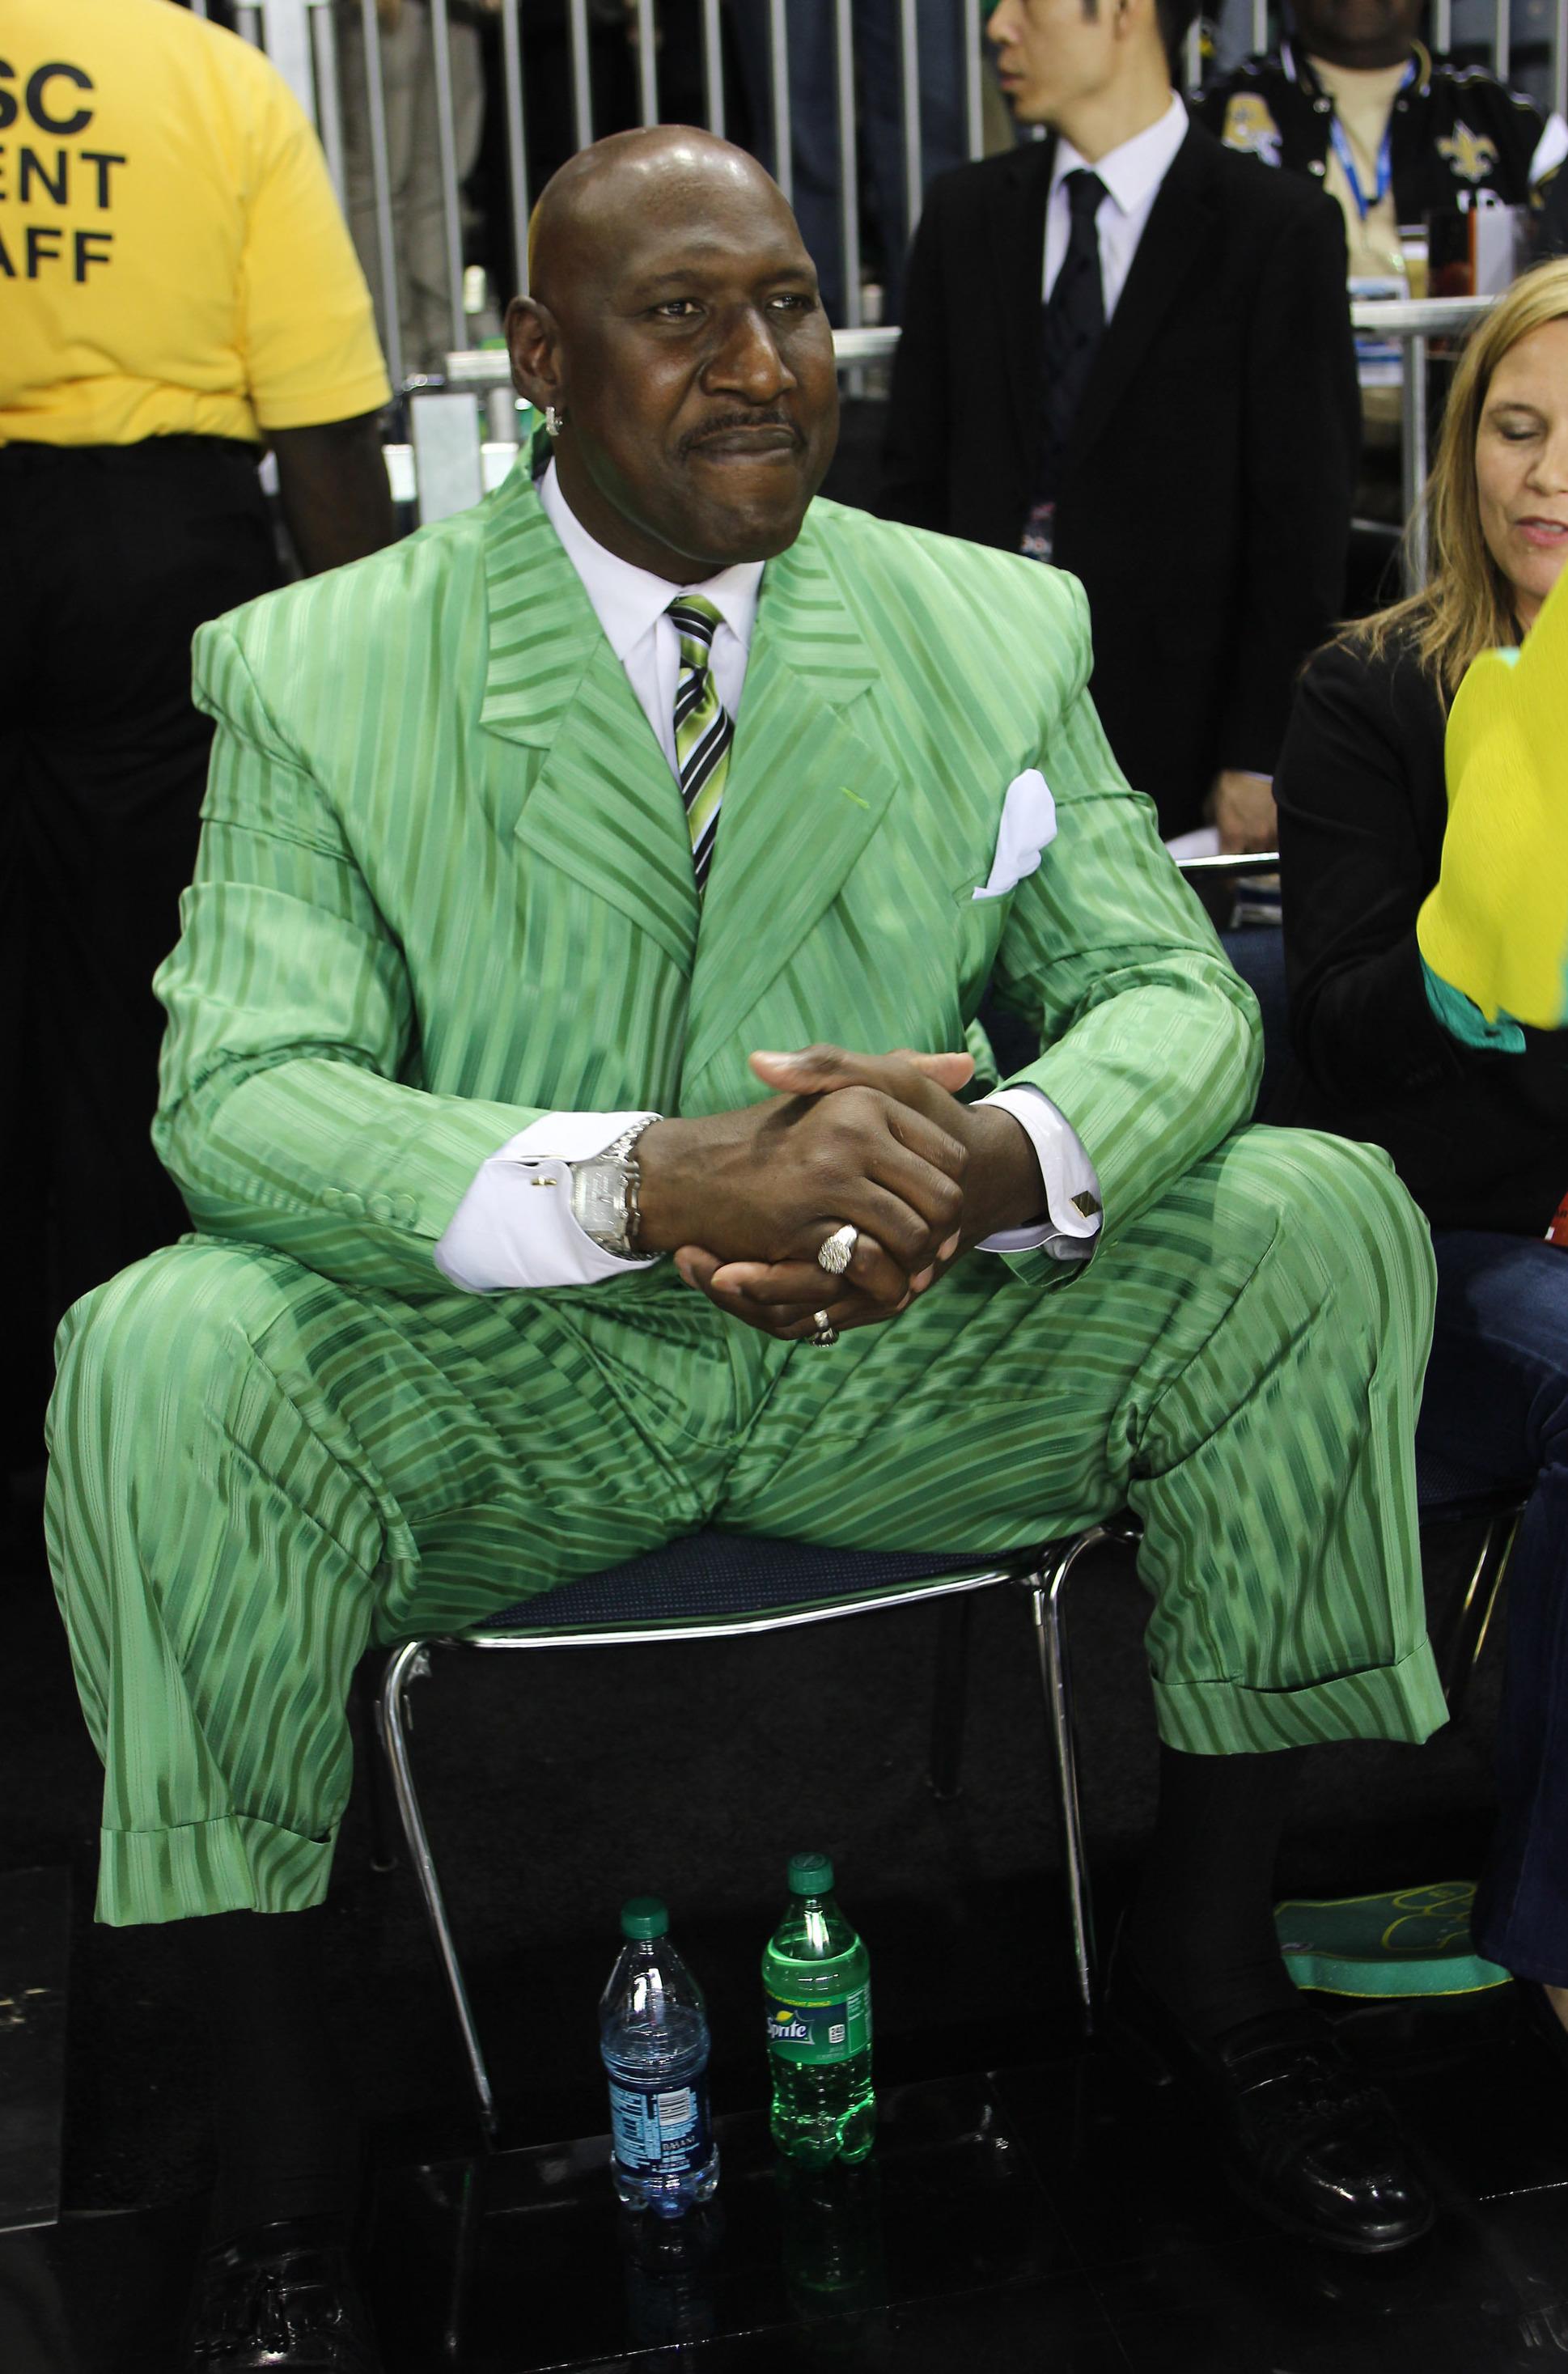 Darryl Dawkins, The NBA's 'Chocolate Thunder,' Has Died | NCPR News